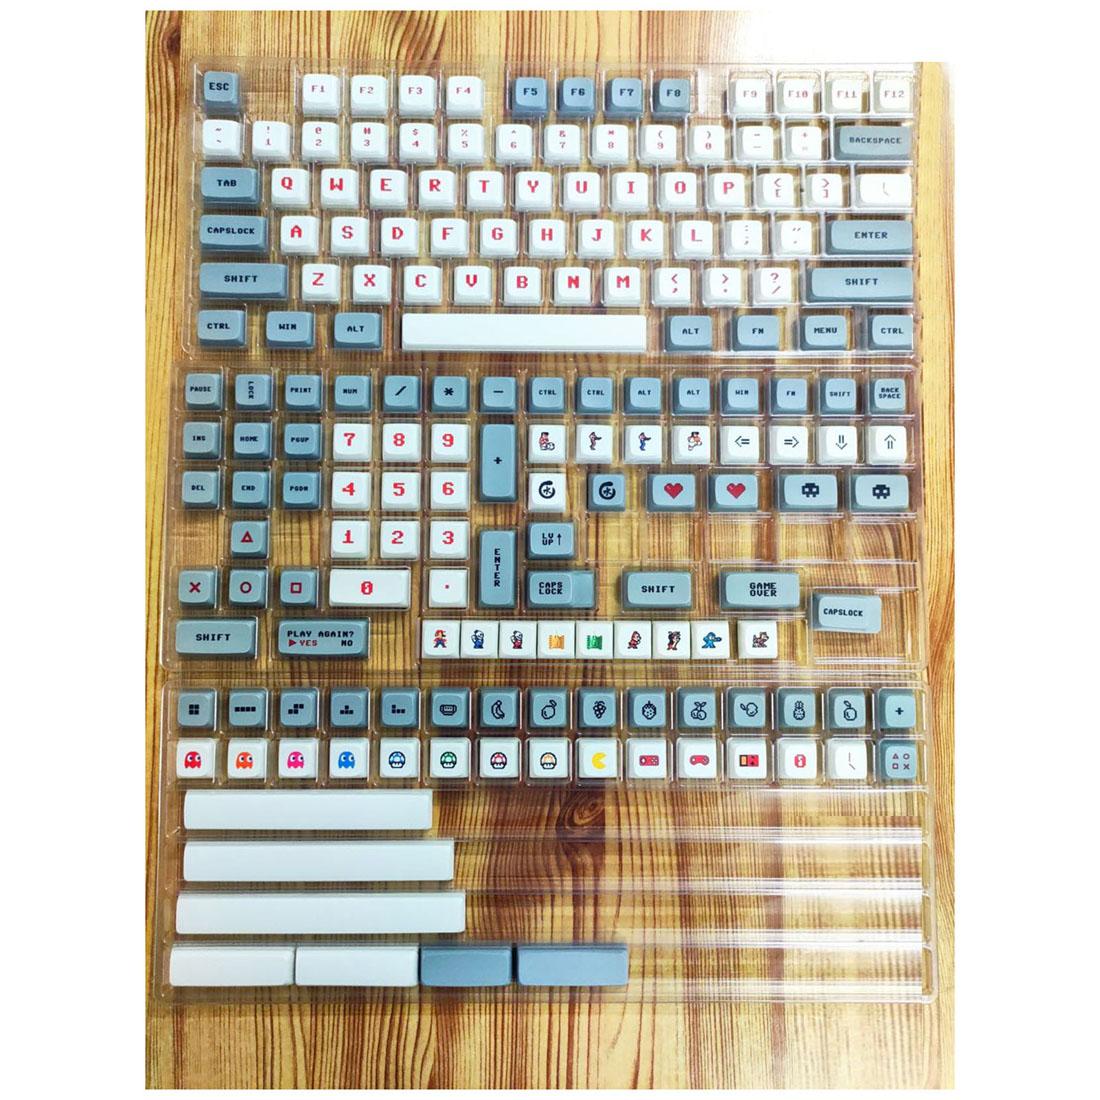 182pcs Gaming Theme Keycaps Set PBT Dye-sub with Puller for 61/64/87/96/104 Keys GH60 /RK61 /Matrix /Joke Custom Gaming Mechanical Keyboard